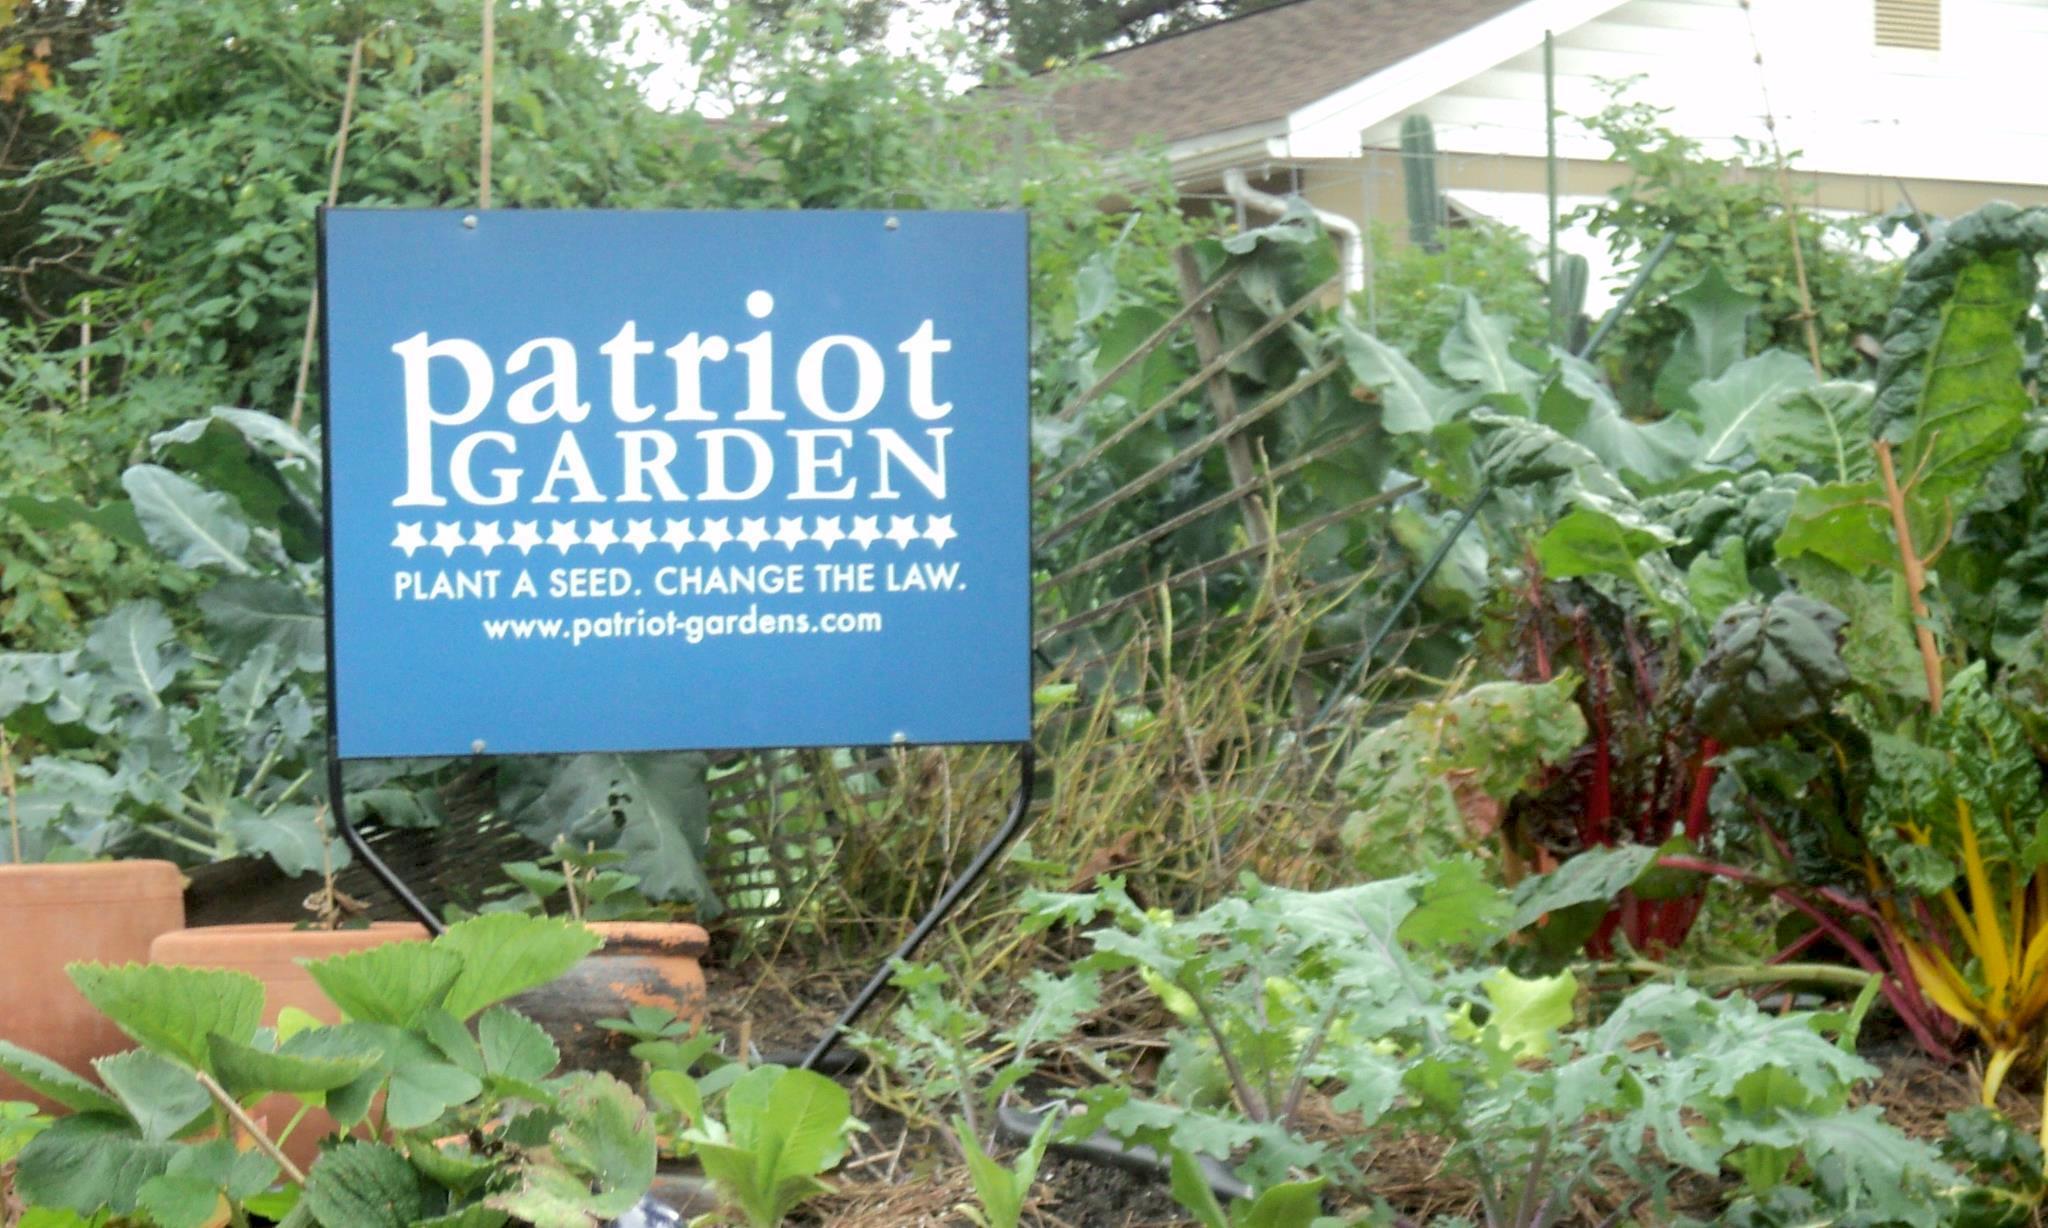 proposal orlando updates landscape and front yard vegetable